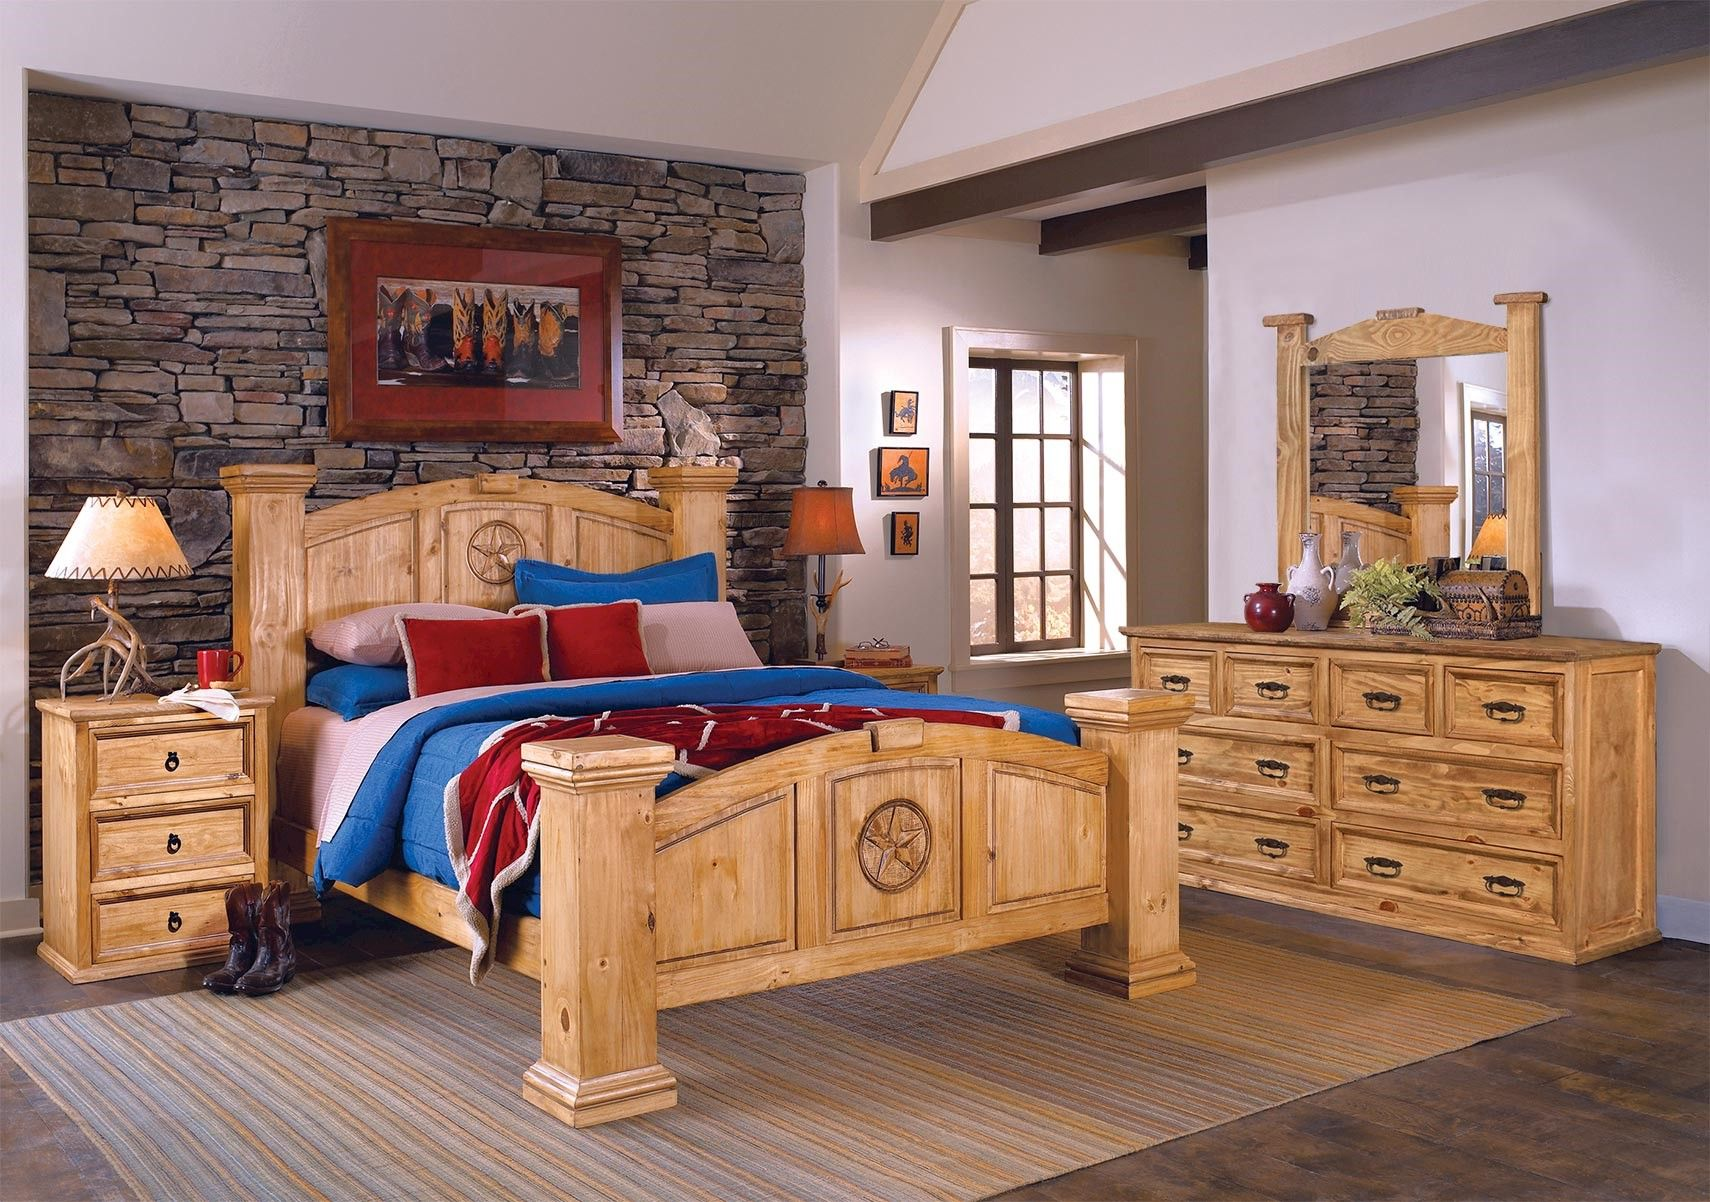 Lacks | Texas Rustic 4-Pc King Bedroom Set | Bedroom sets ...